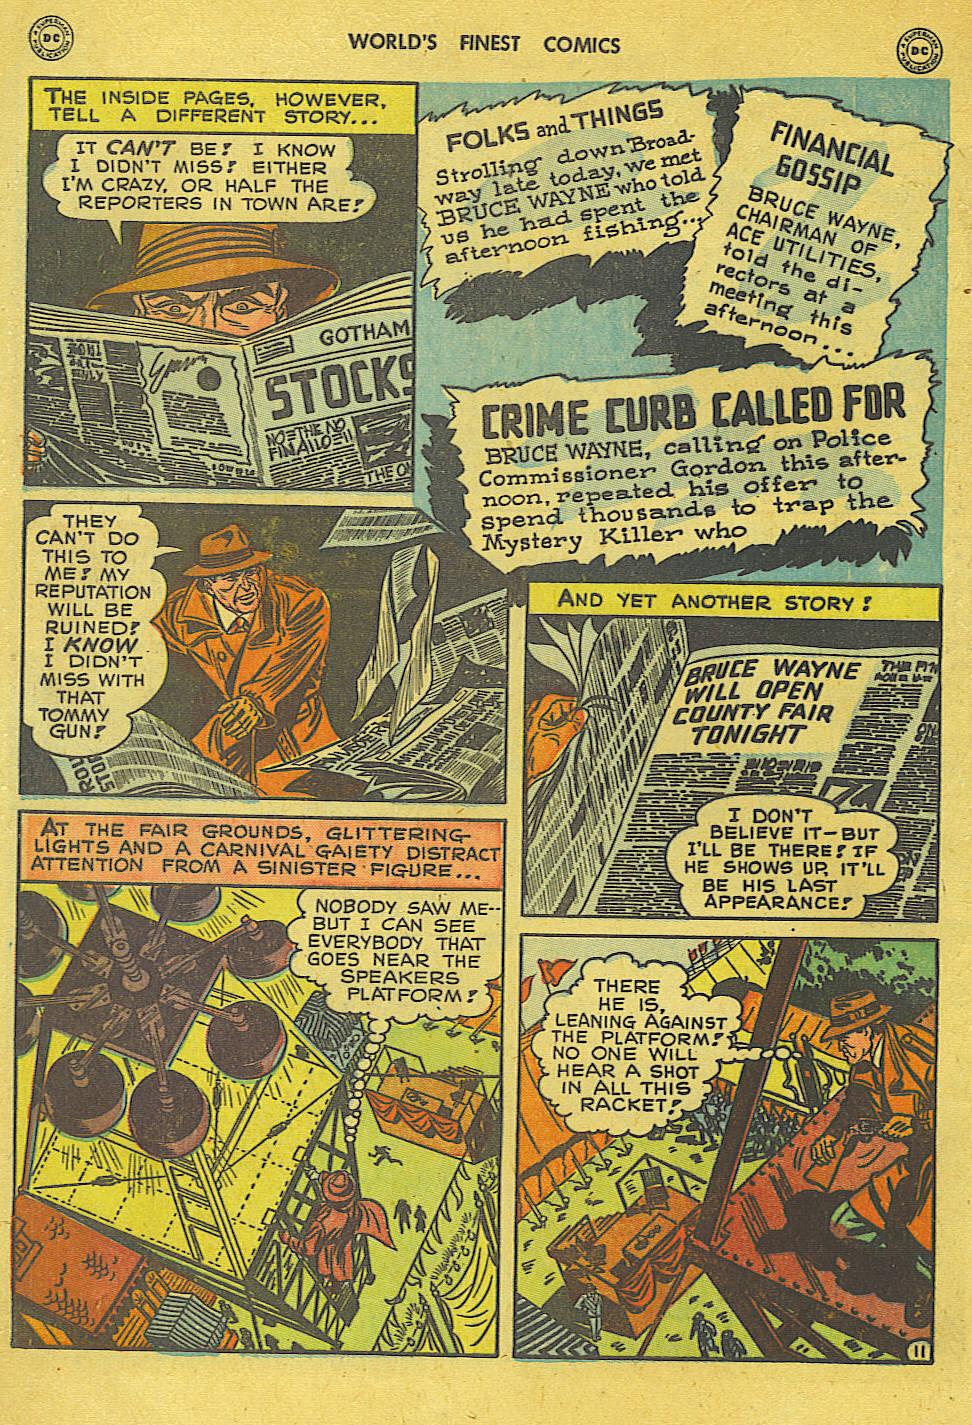 Read online World's Finest Comics comic -  Issue #34 - 72